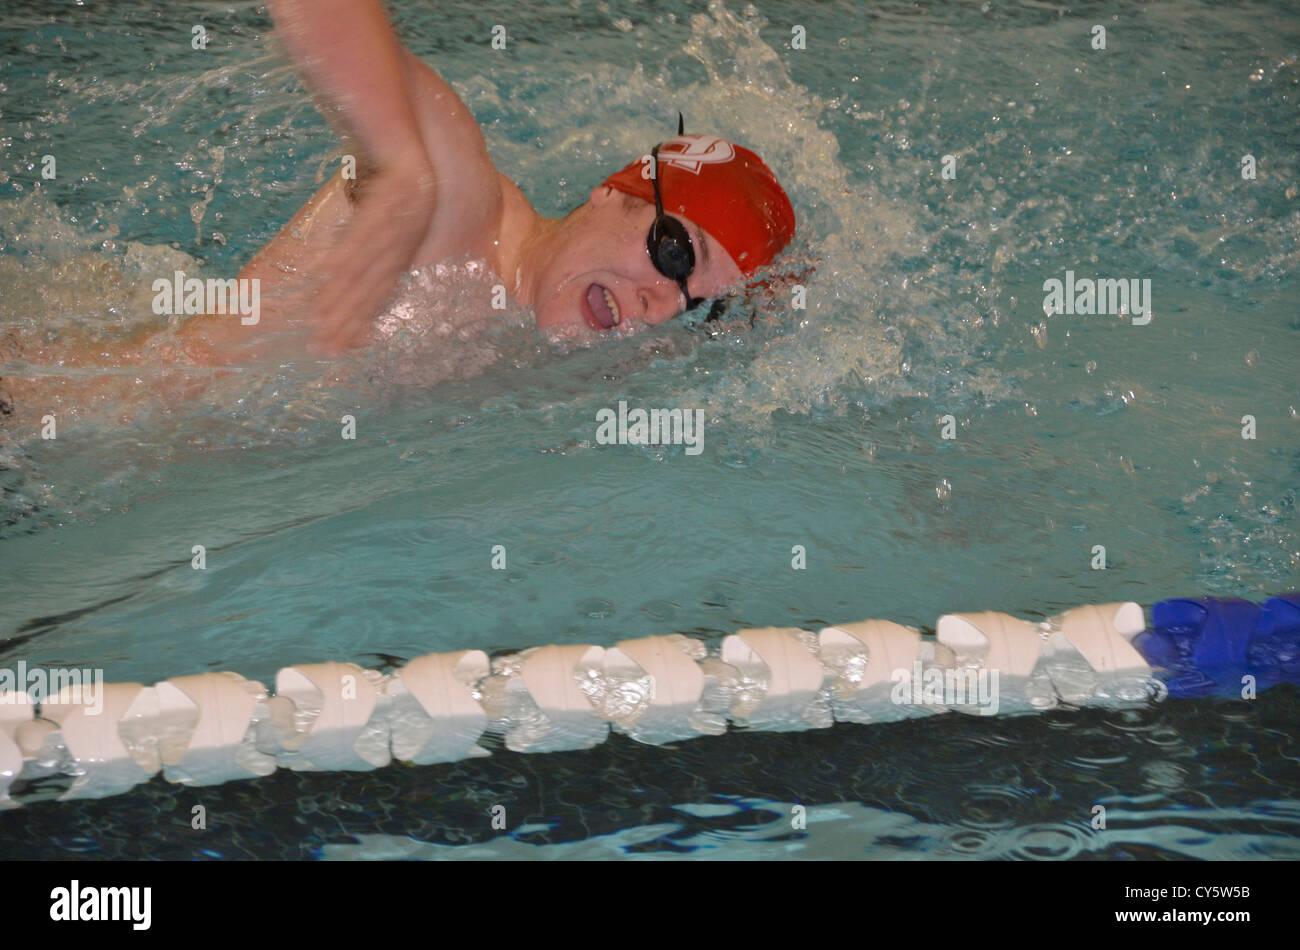 swimmer in swim meet - Stock Image